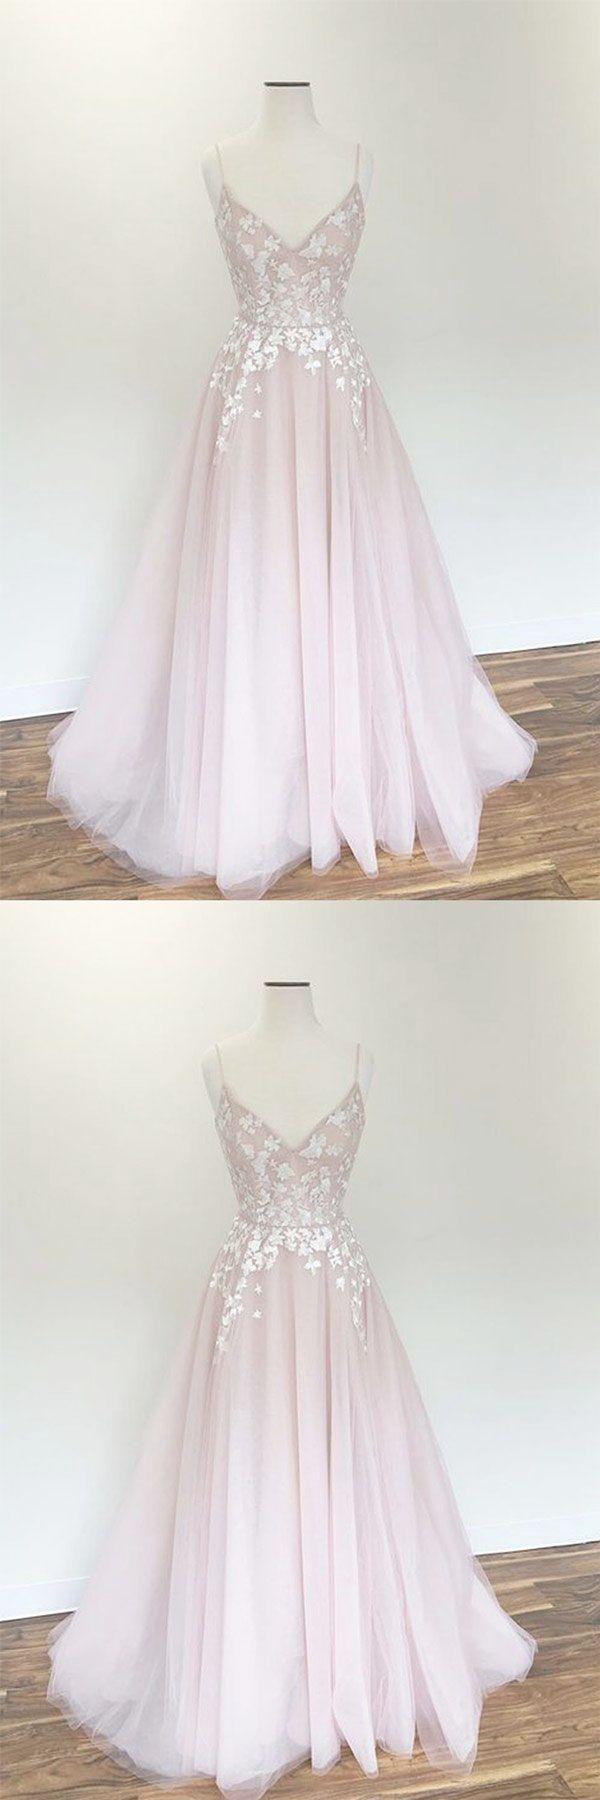 Spectacular prom dresses under davidus bridal excellent